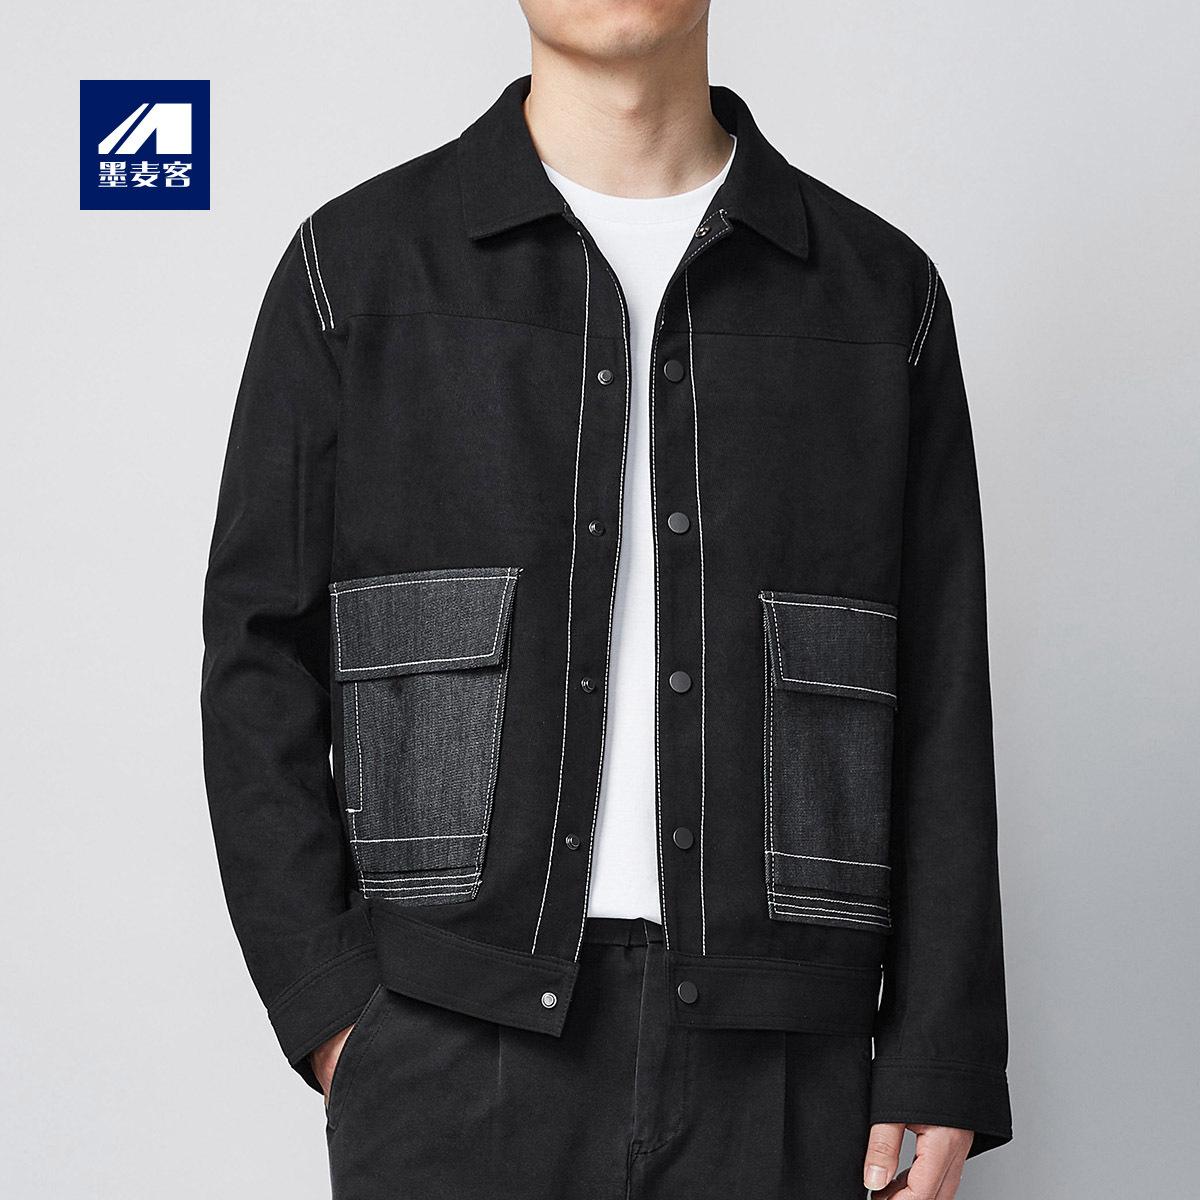 M-MAICCO Momicker Men's Wear Spring 2021 New Contrast Stitching Casual Jacket Men's Fashion Lapel